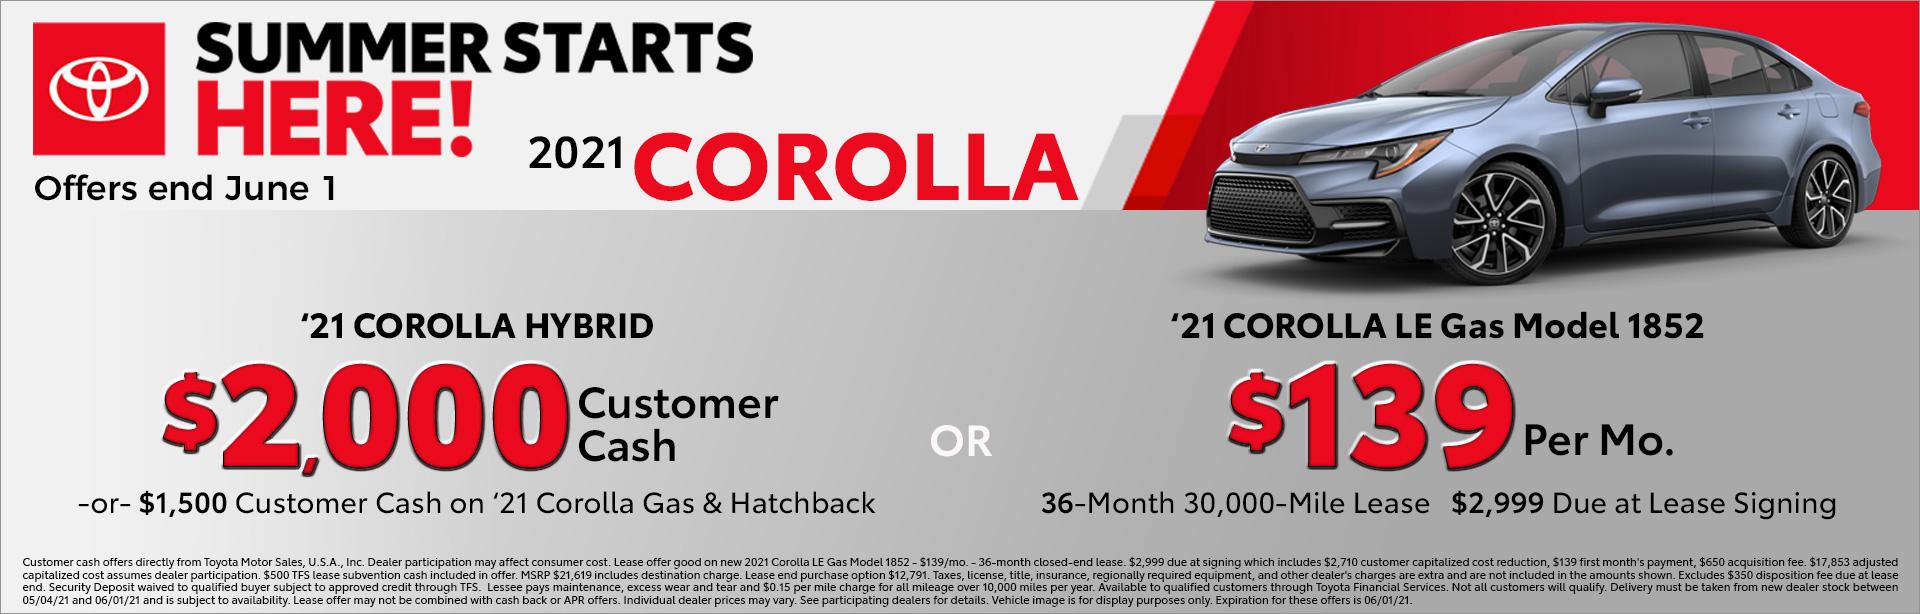 05-21_01_Cincinnati-May-2021-CIN-Summer-Starts-Here-Corolla-_1920x614_63c9_Corolla-Corolla-Hatchback-Corolla-Hybrid_O_xta.jpeg